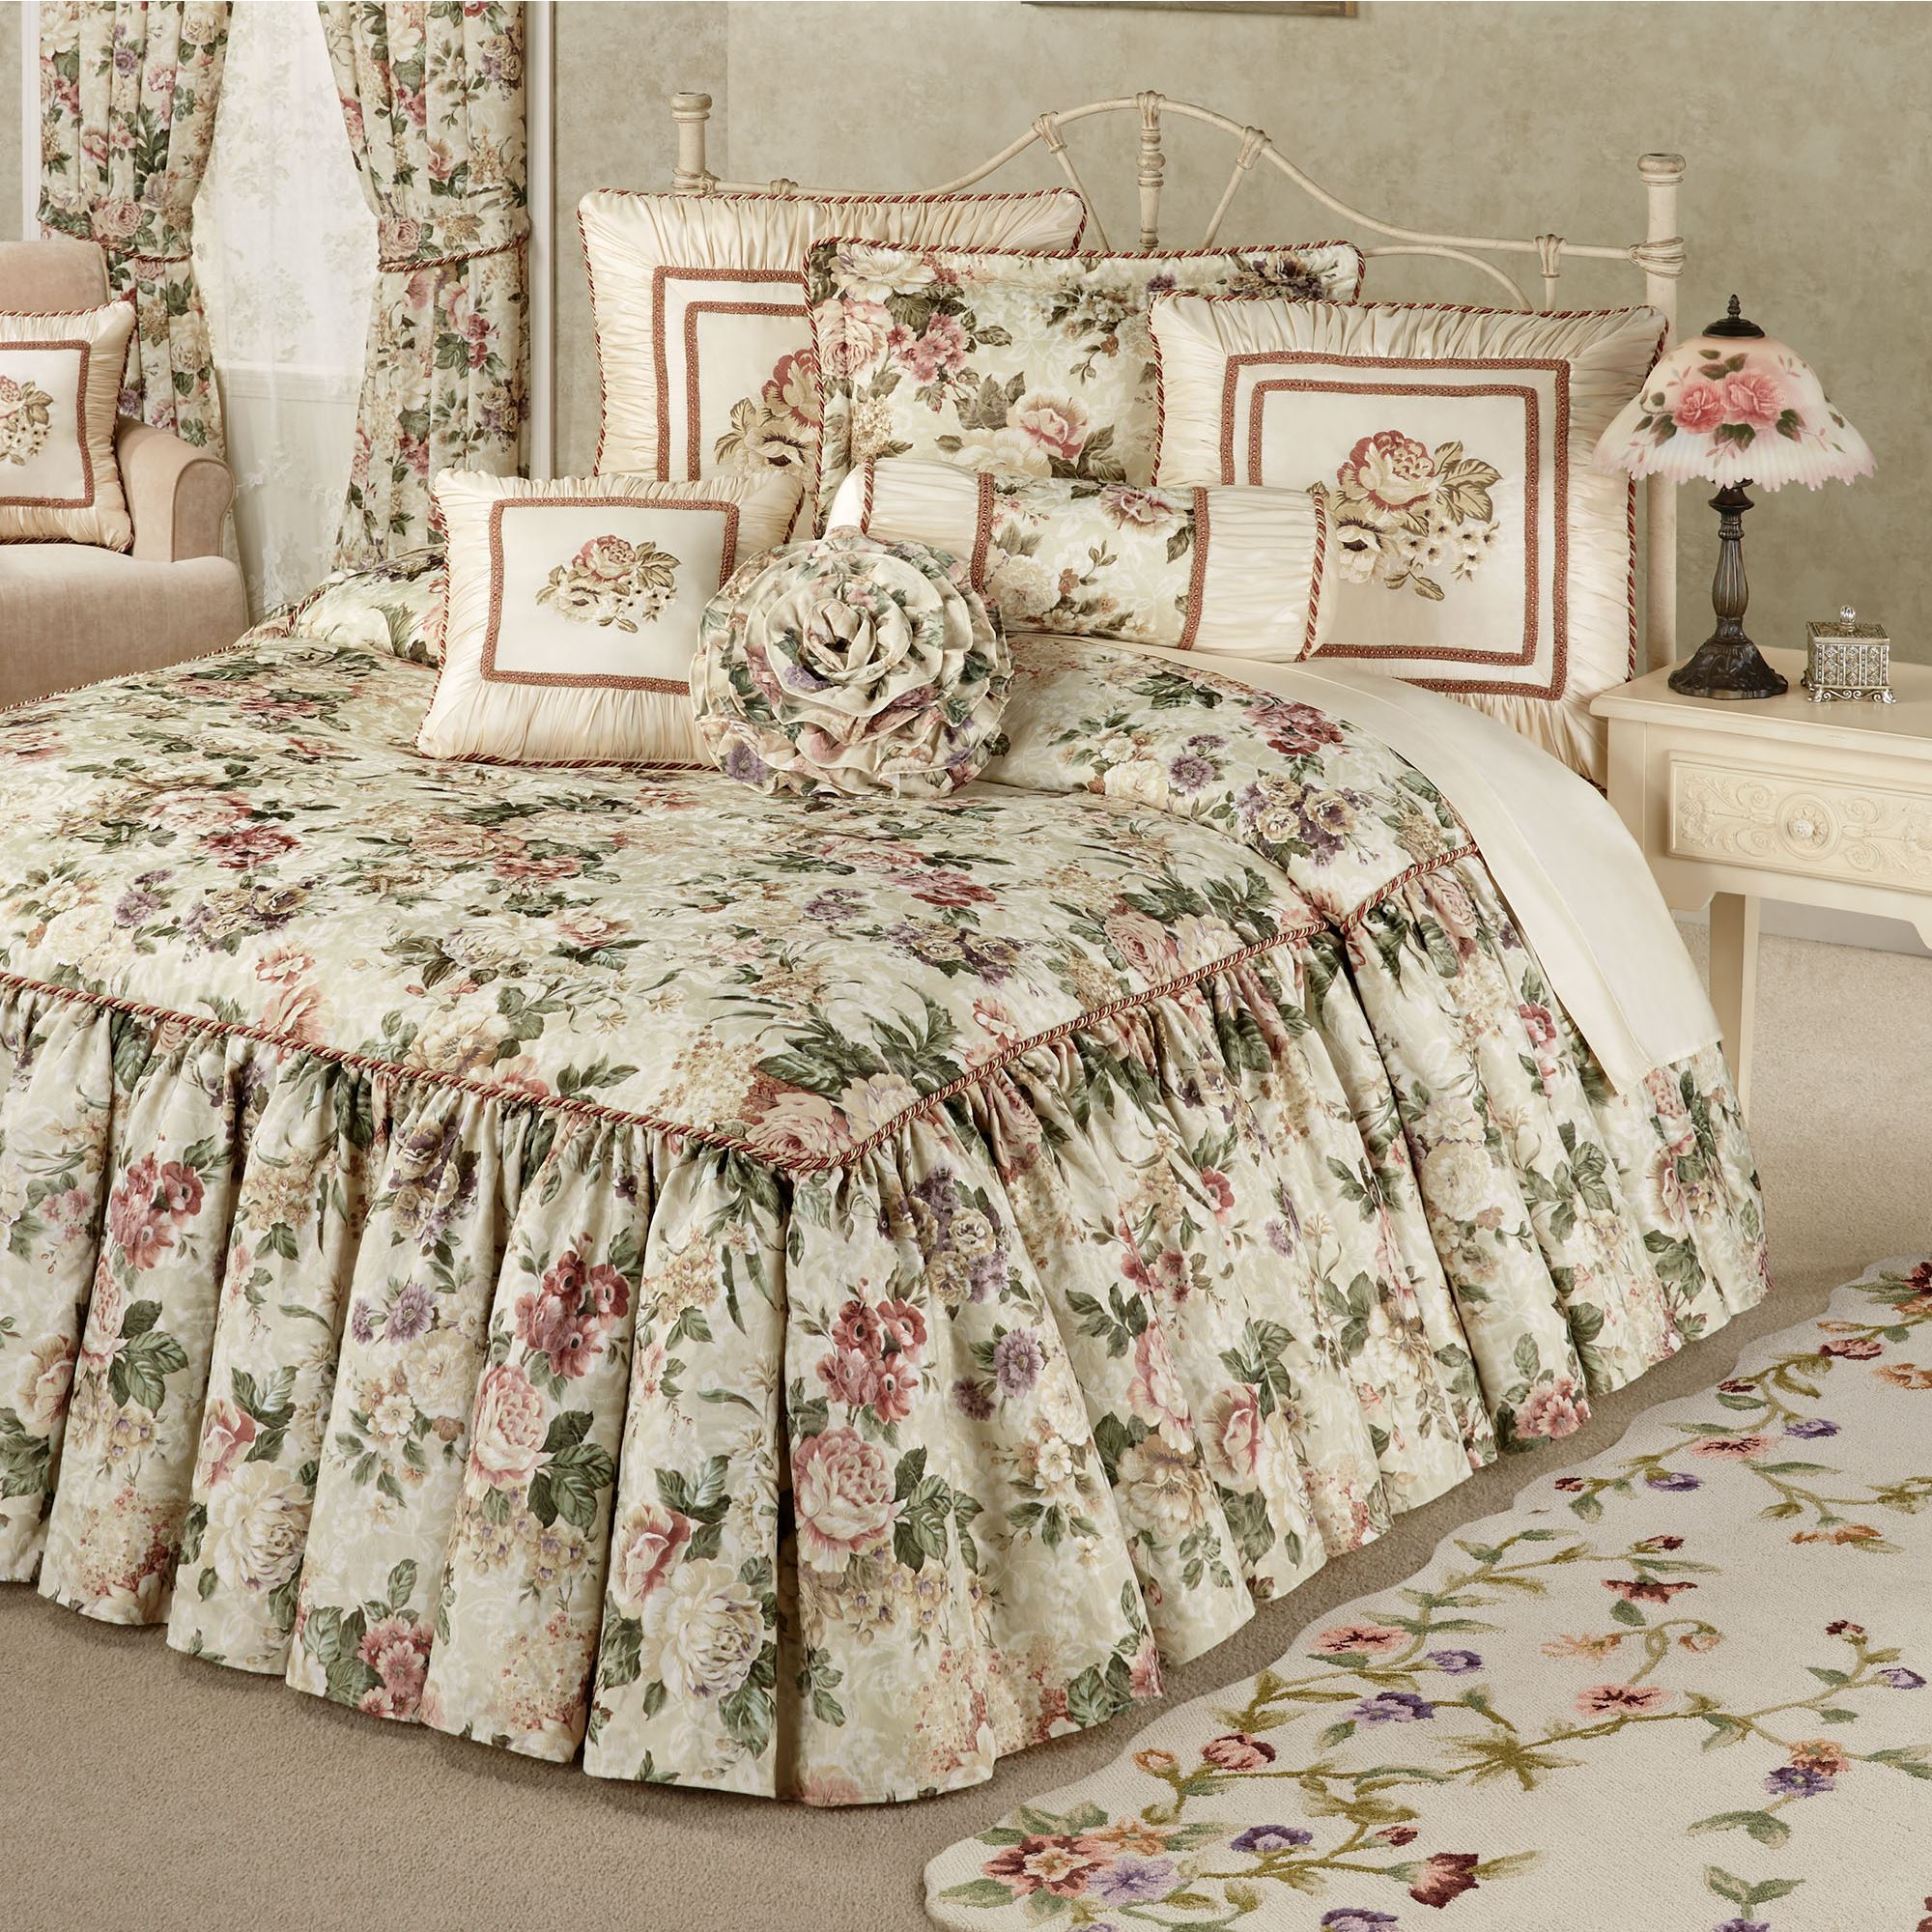 Floral Jubilee Light Cream Oversized Bedspread